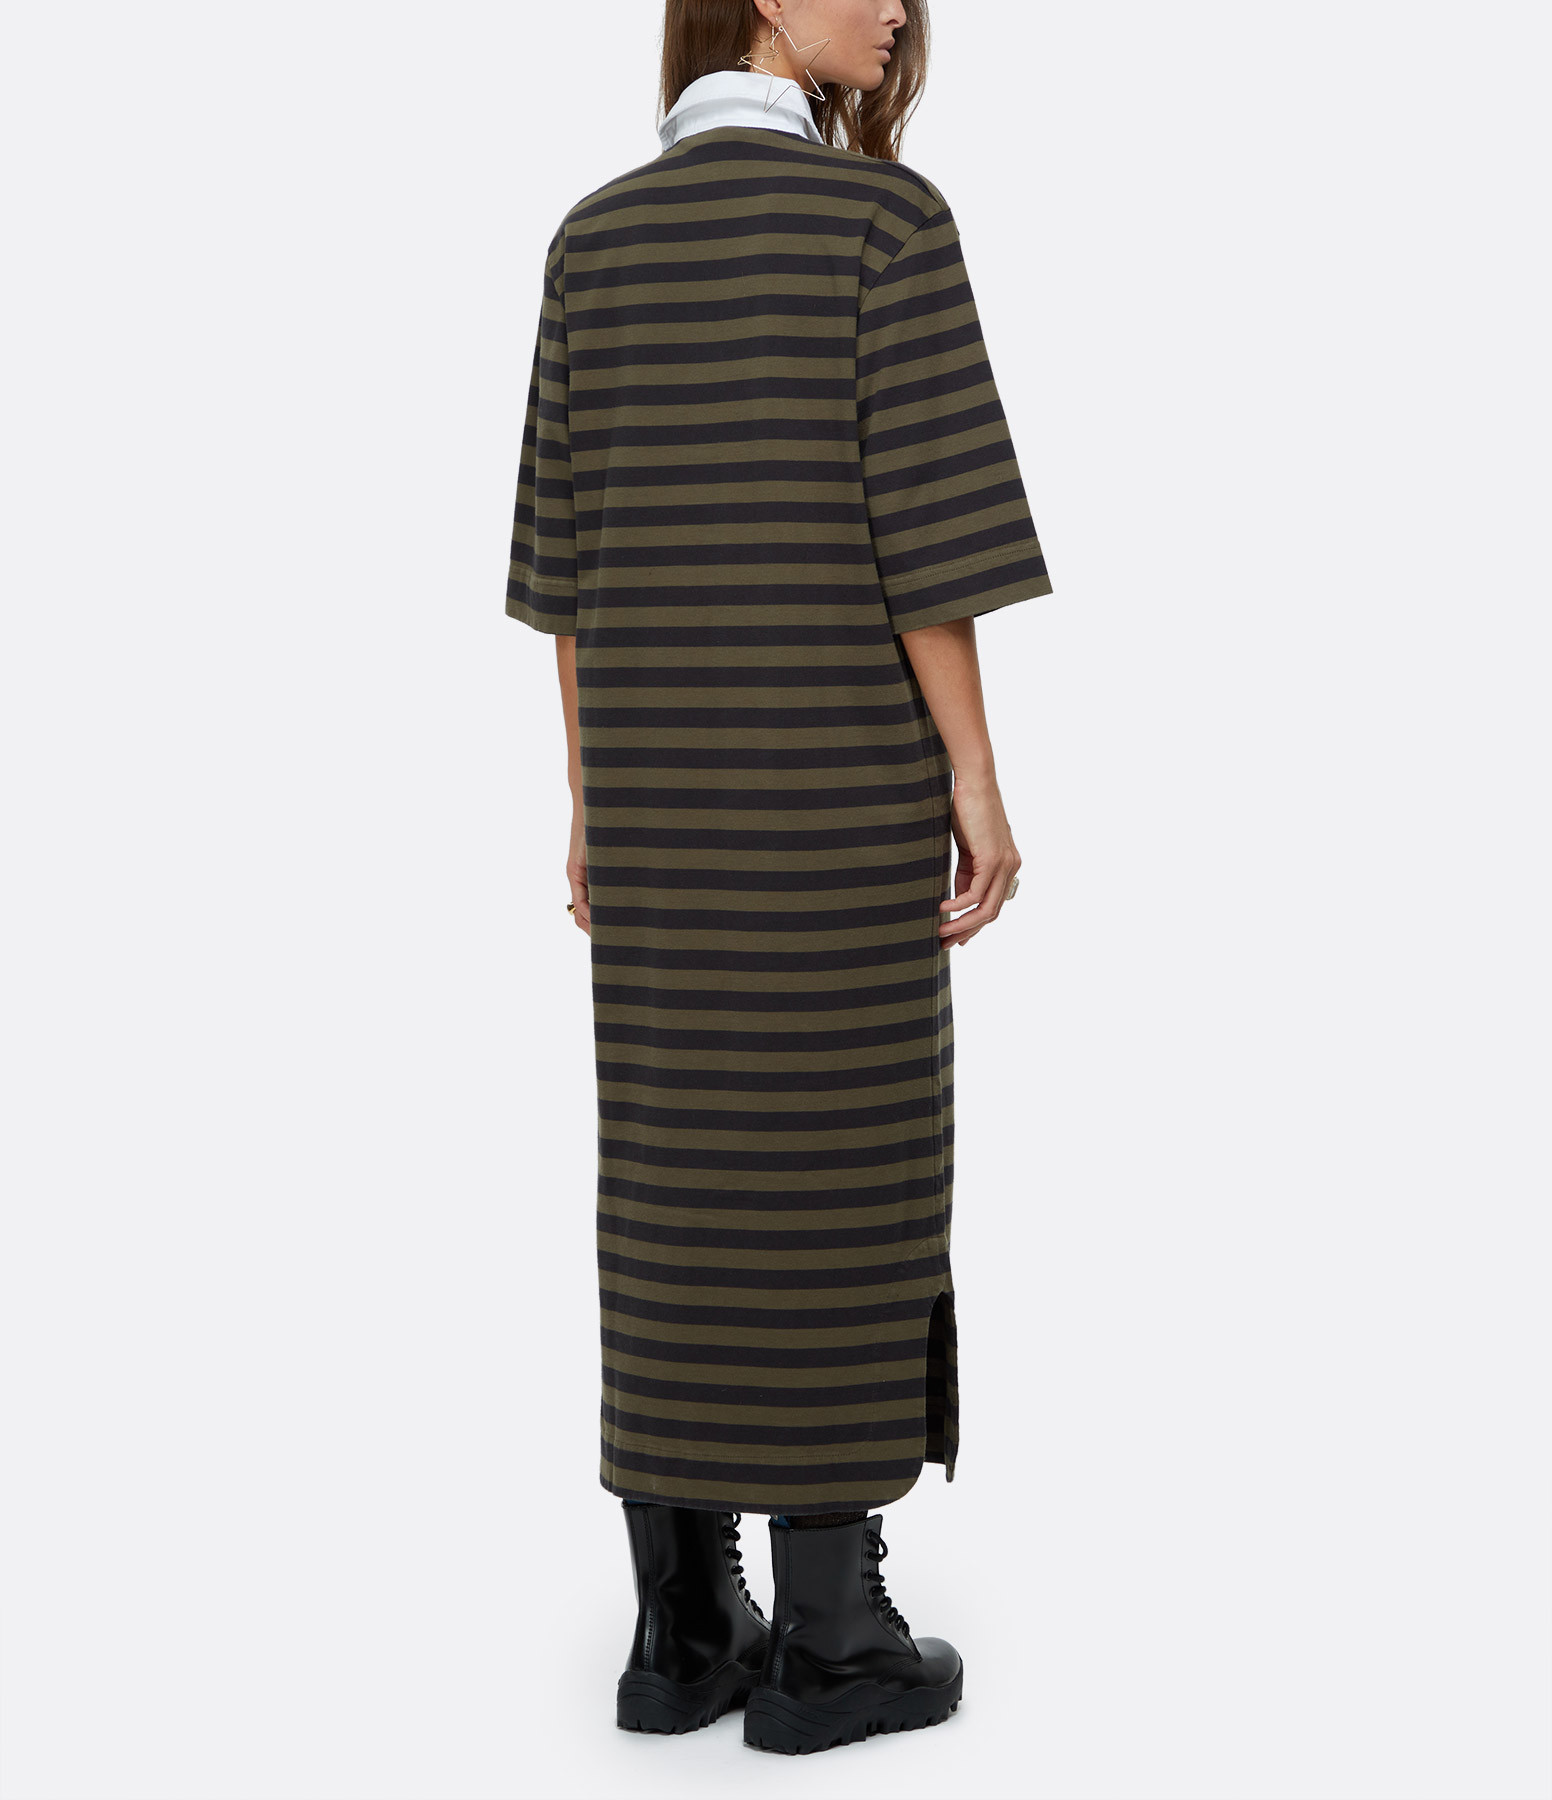 GANNI - Robe Tee-shirt Coton Biologique Rayures Kaki